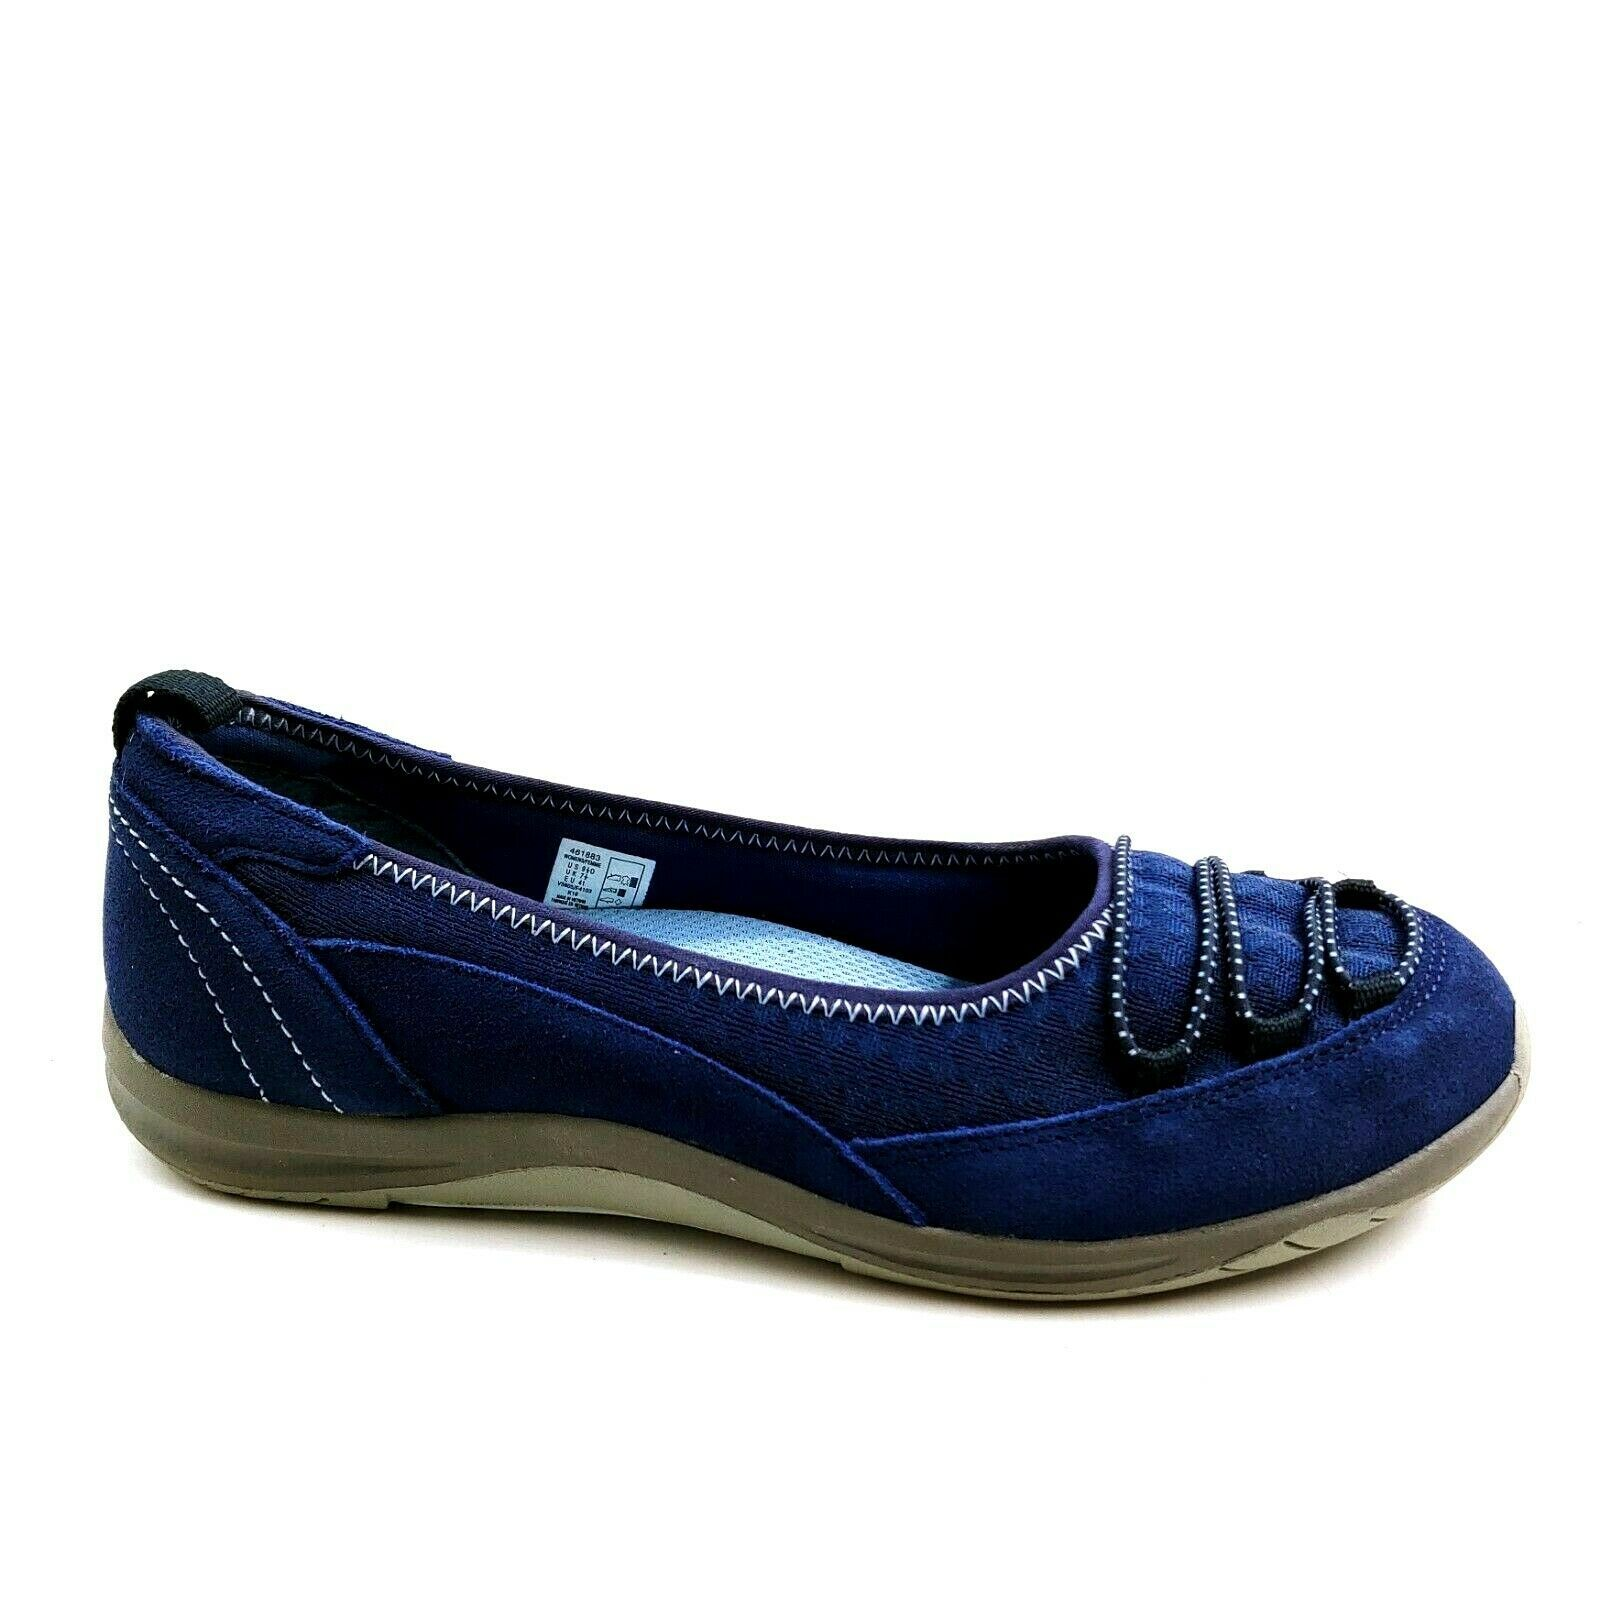 Lands End Womens Casual Bungee Ballet Flats Suede Mesh 461883 Deep Sea Blue 9.5D - $39.59